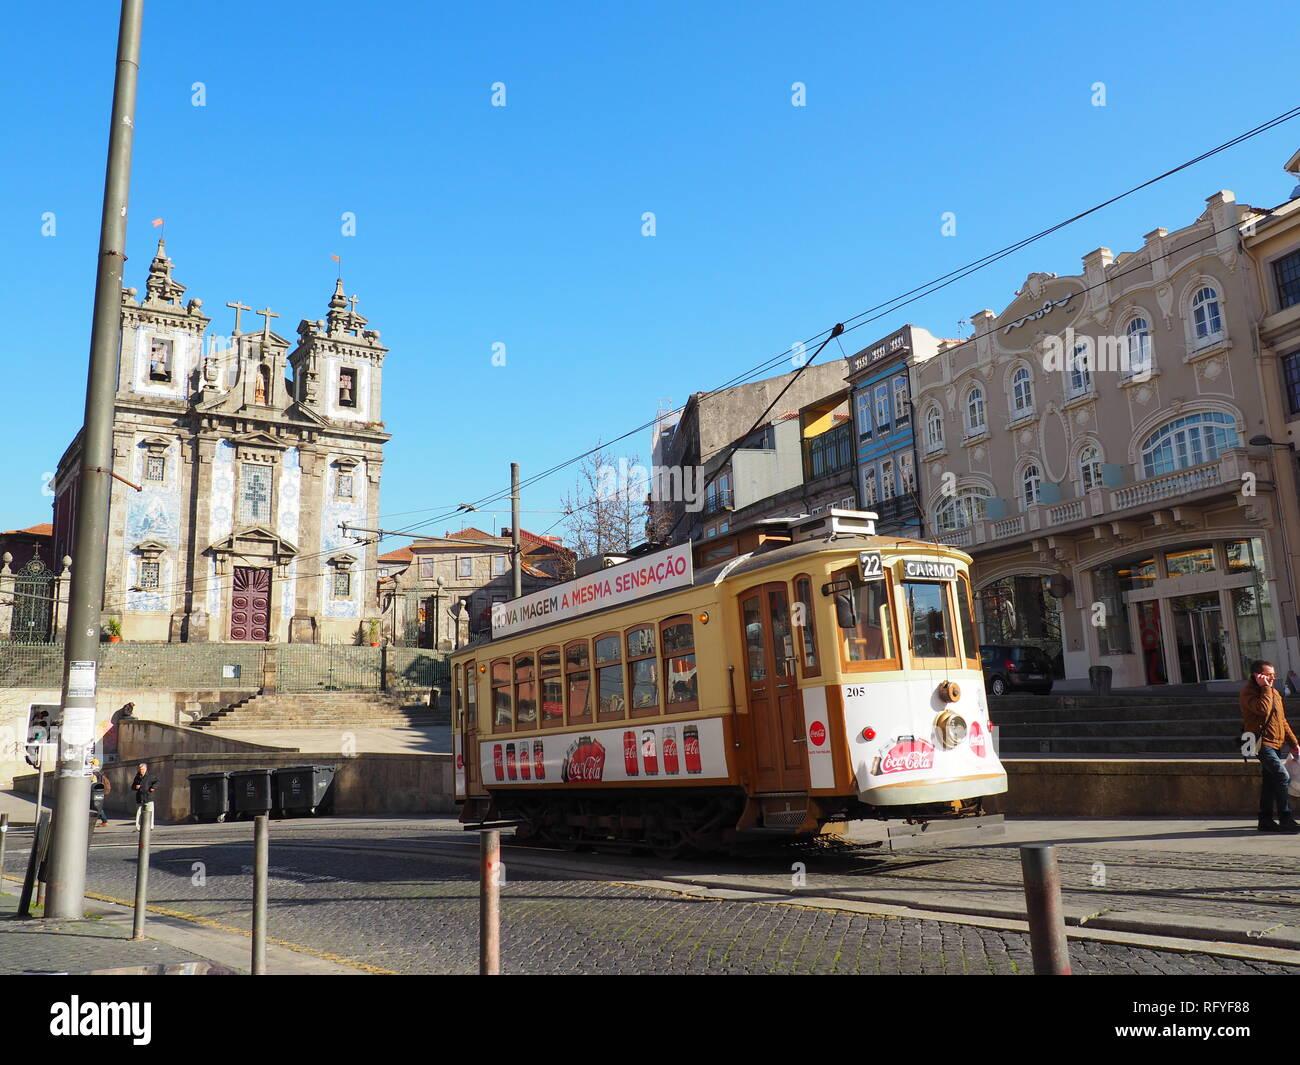 Tram running outside the church 'Igreja de Santo Ildefonso' in Porto - Portugal - Stock Image